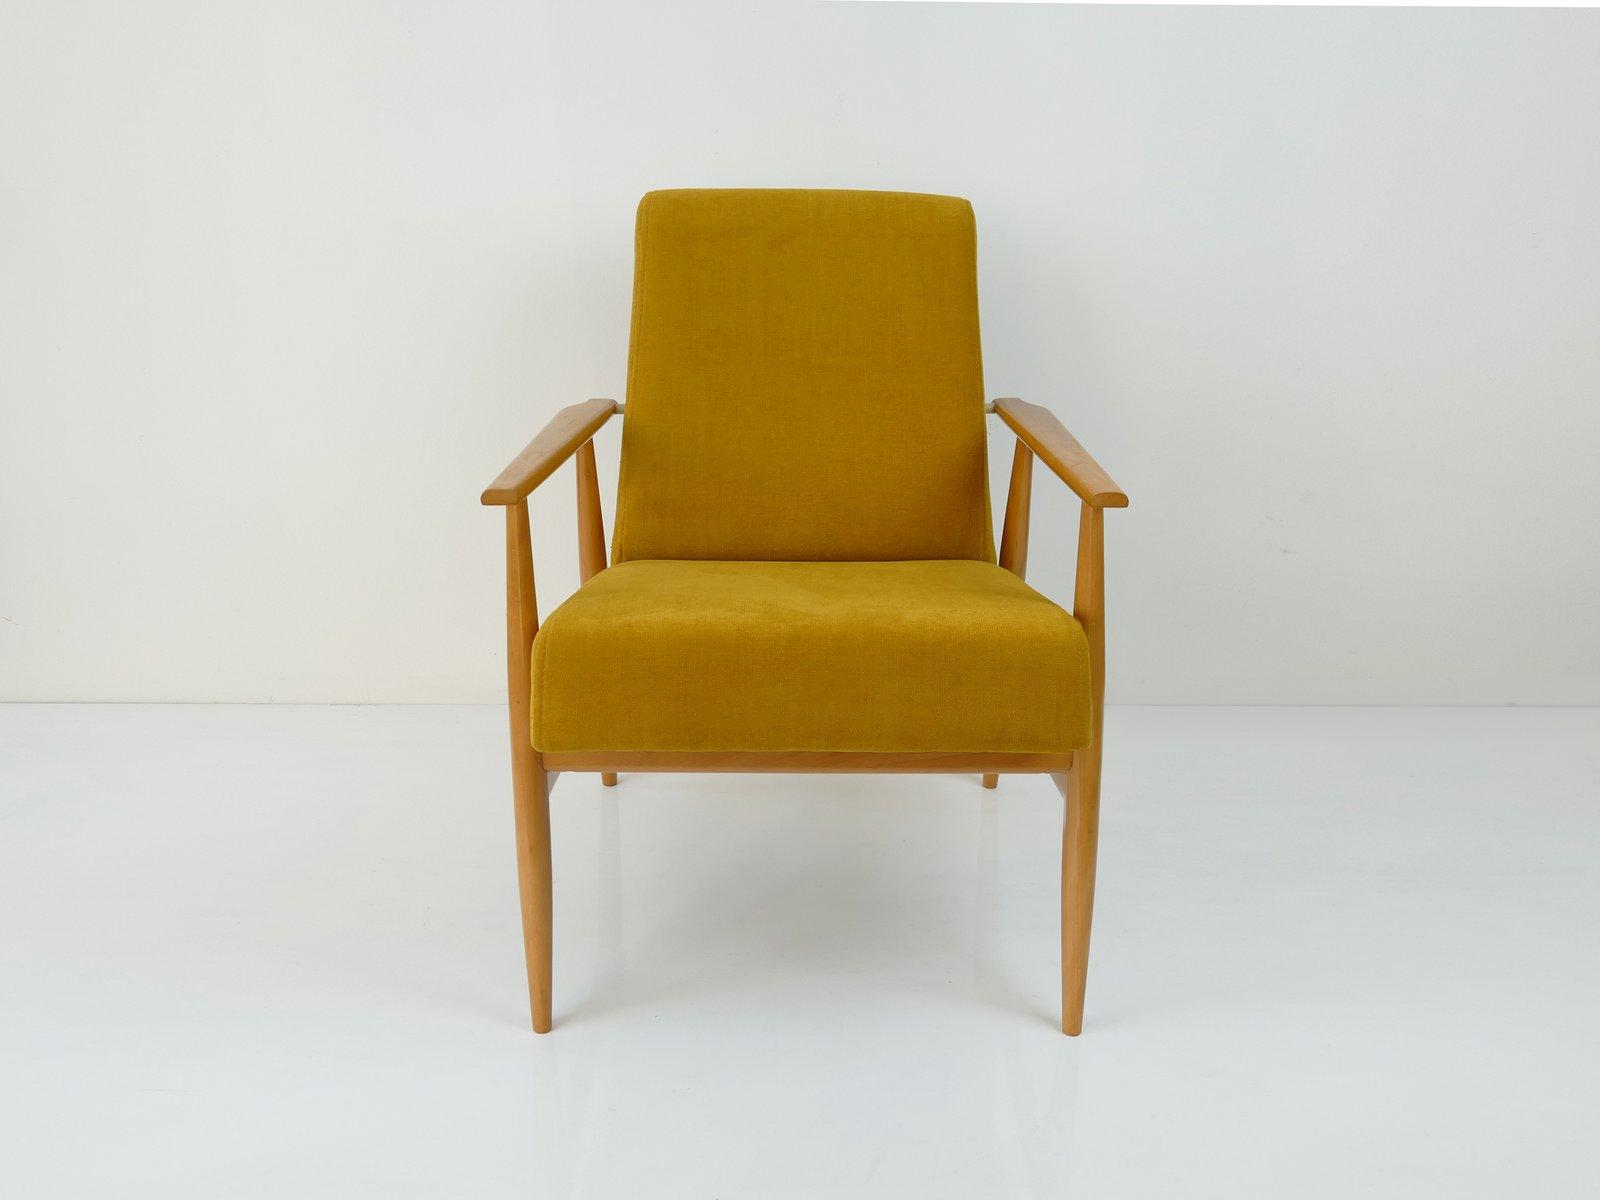 Vintage Polish Yellow Armchair 9. $997.00. Price per piece